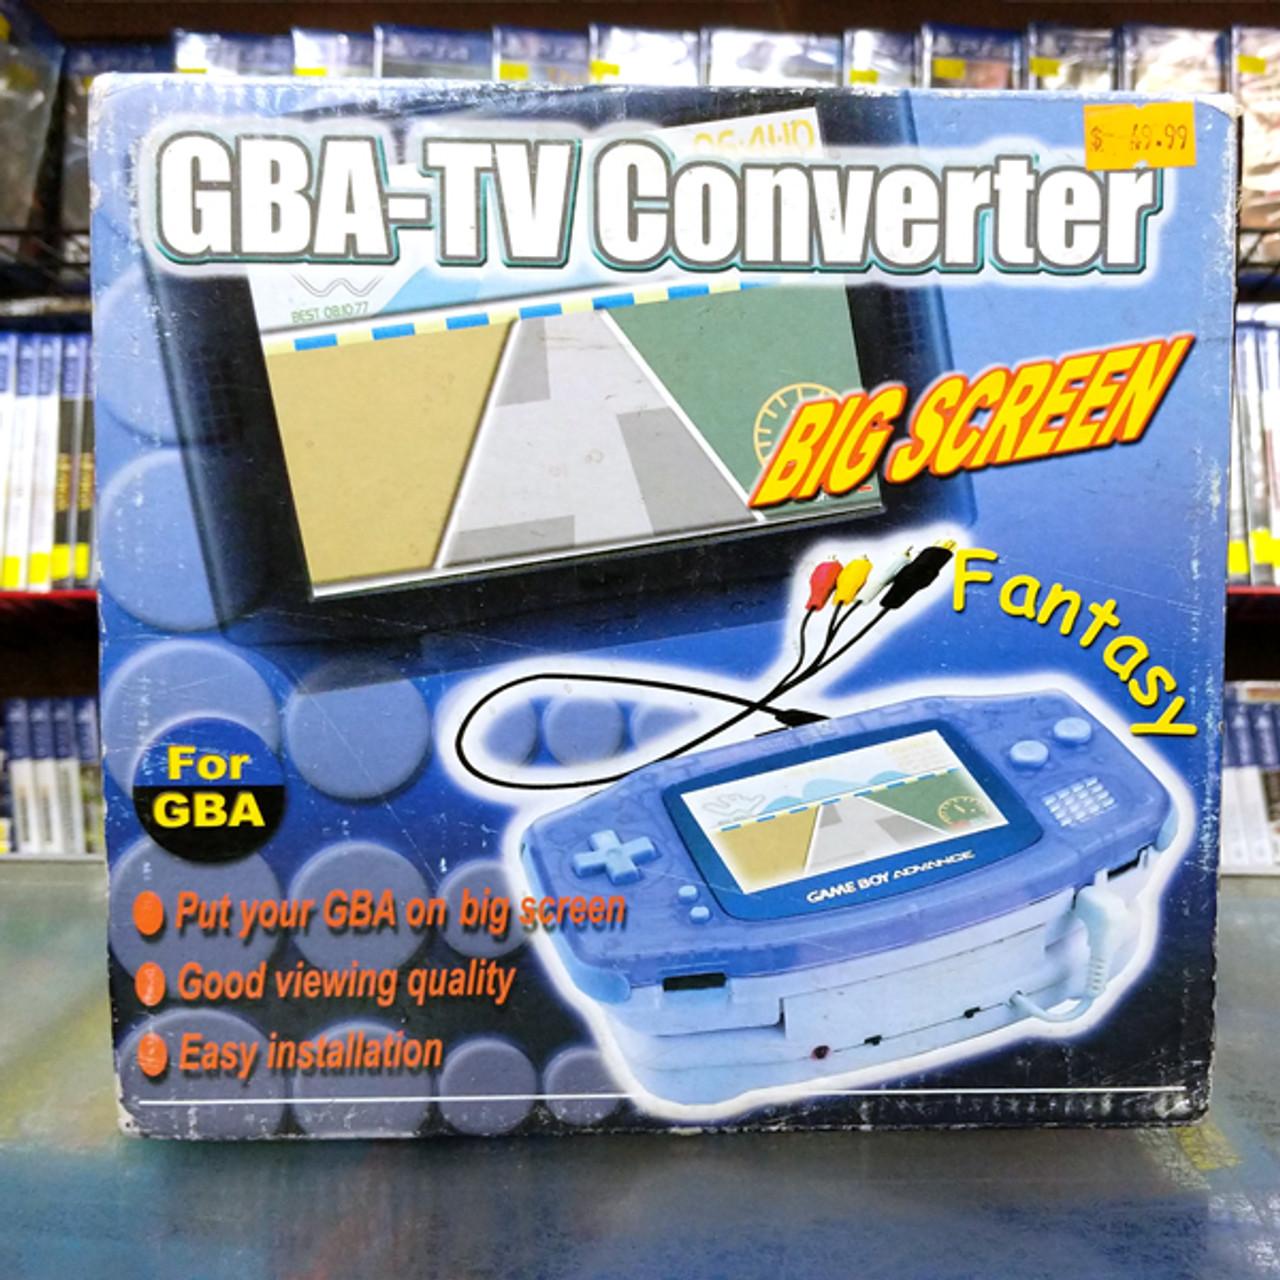 Gba Save Converter